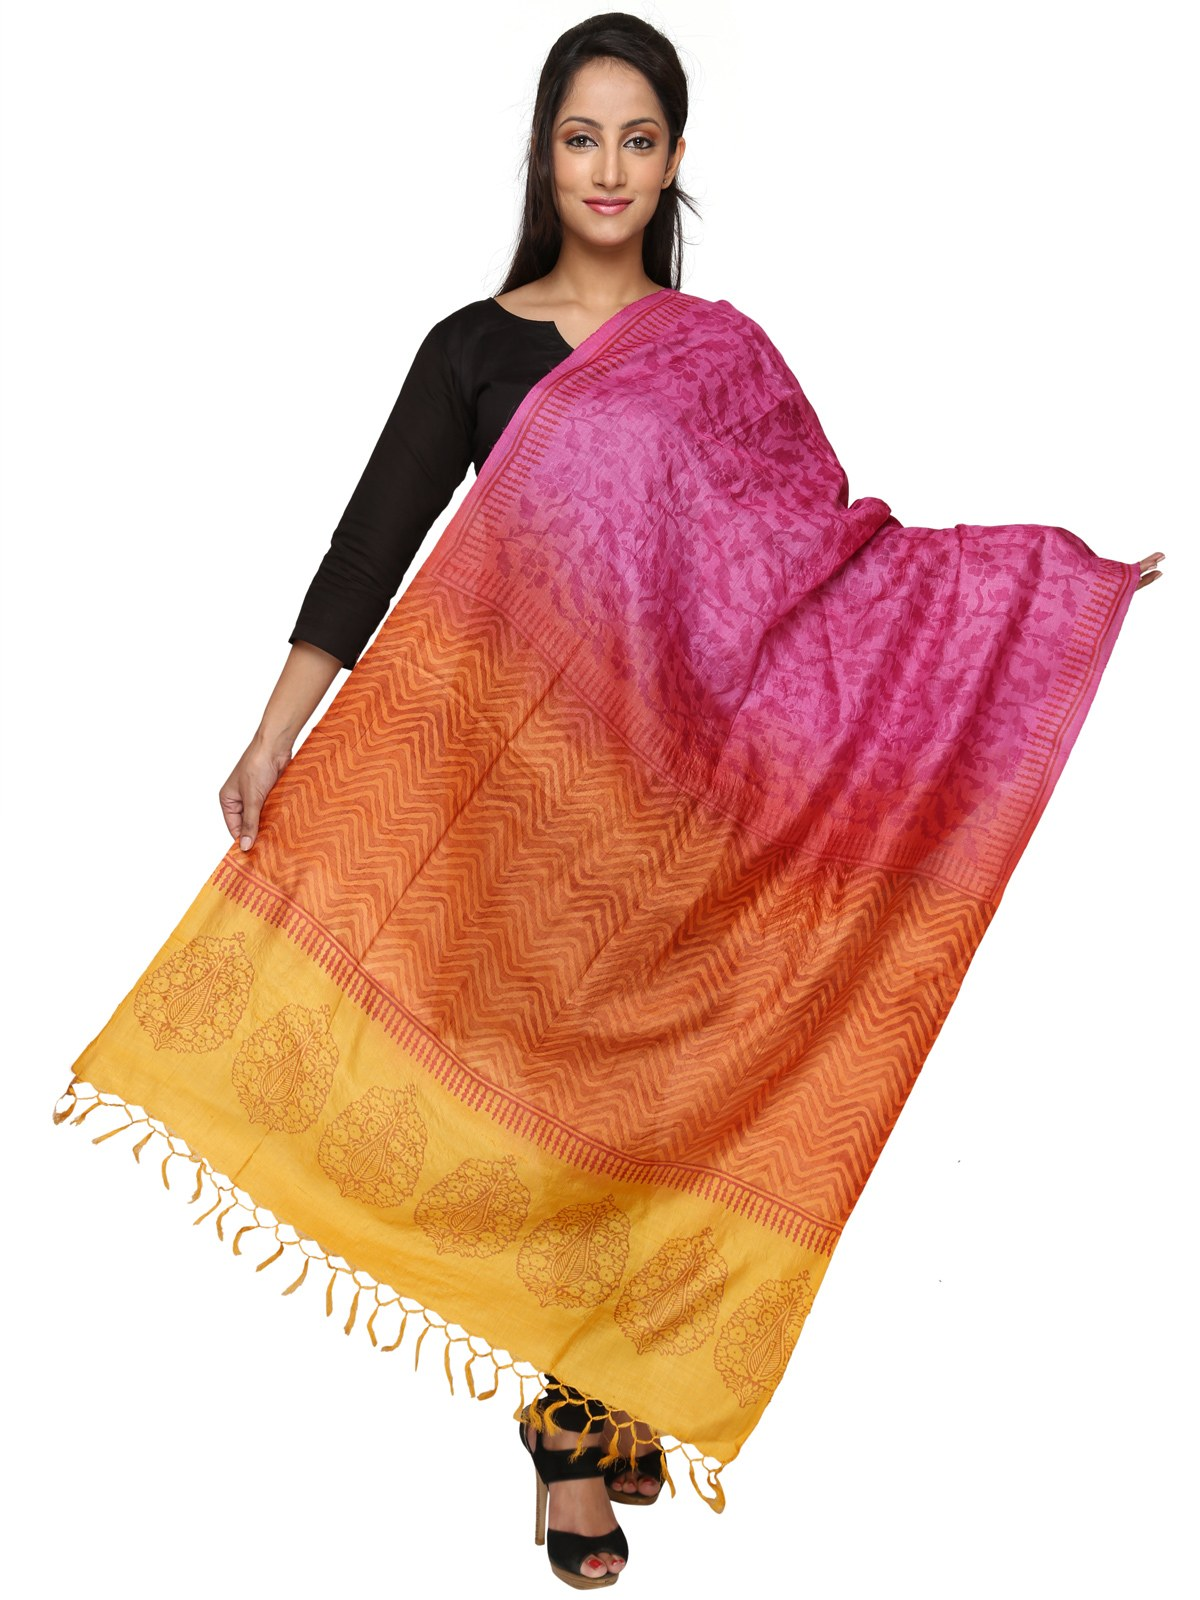 Silk dupatta online shopping india